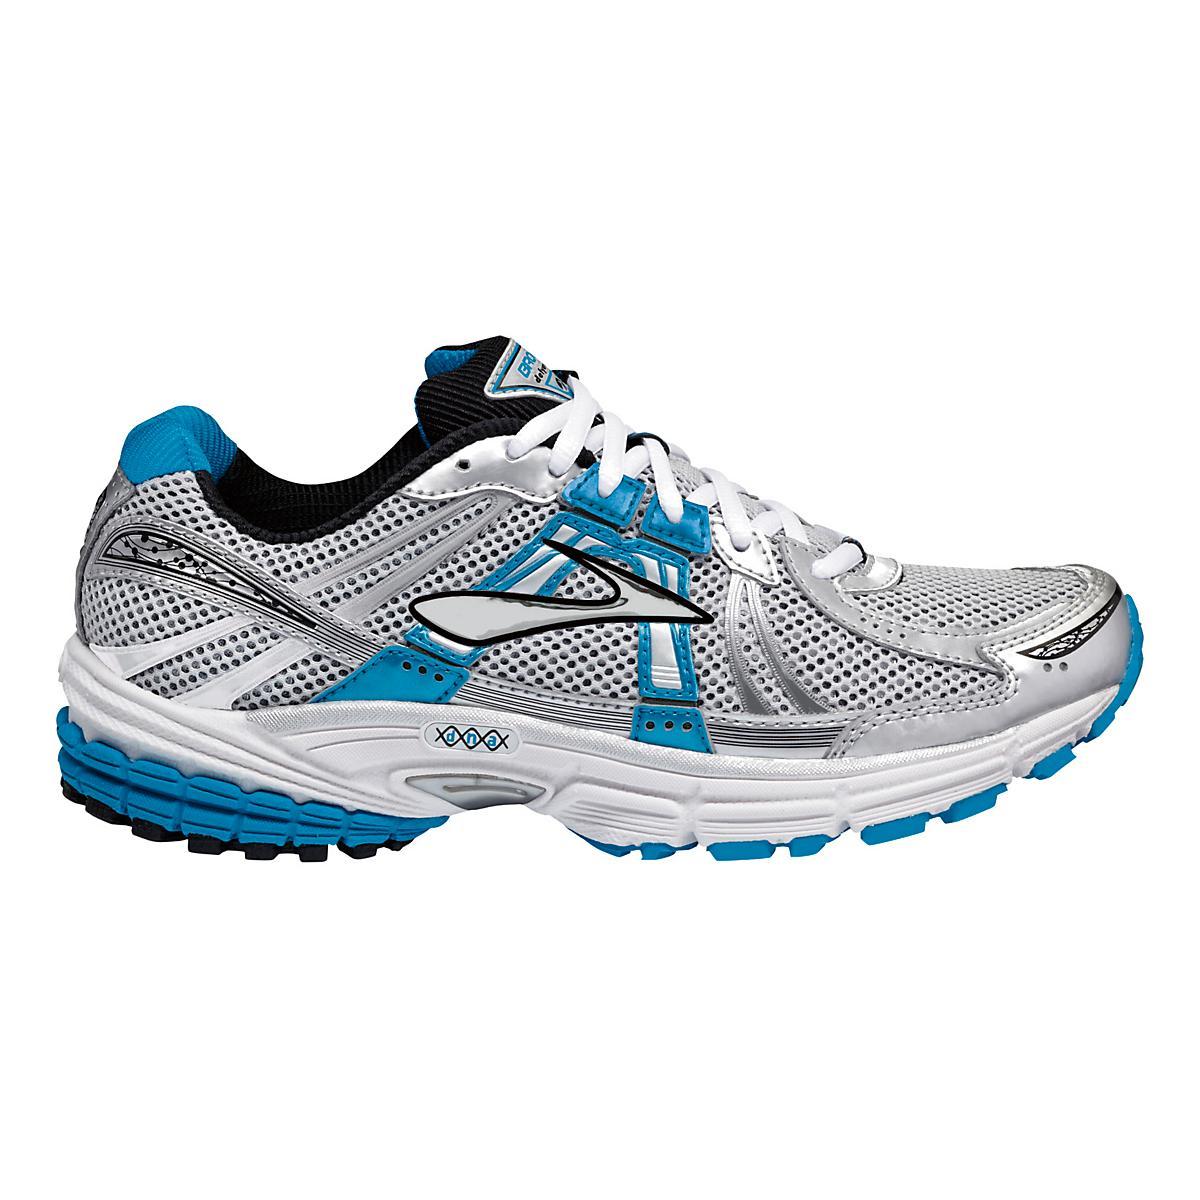 58ed2a9b3ca Womens Brooks Defyance 6 Running Shoe at Road Runner Sports